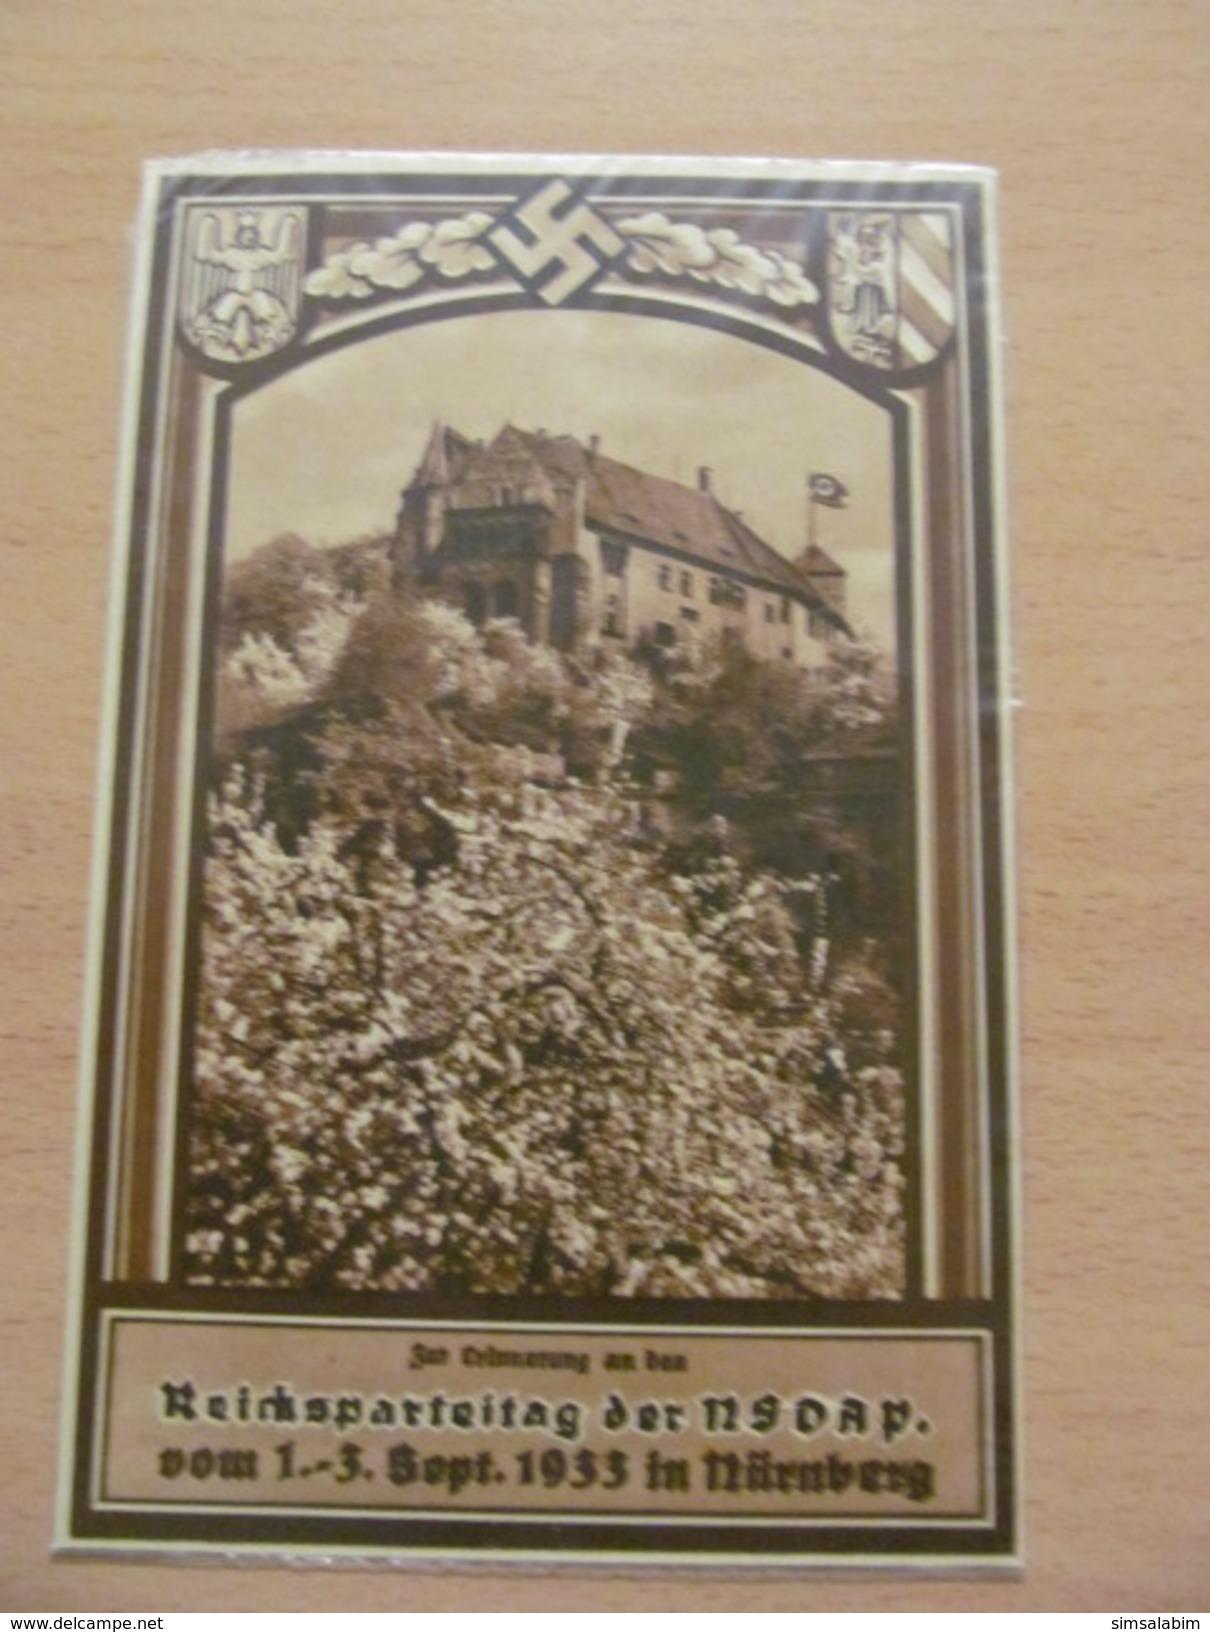 3. Reich ,Parteitagskarte Nürnberg 2.9.33 Mit Nürnberger Burg U Propagandastempel - Briefe U. Dokumente